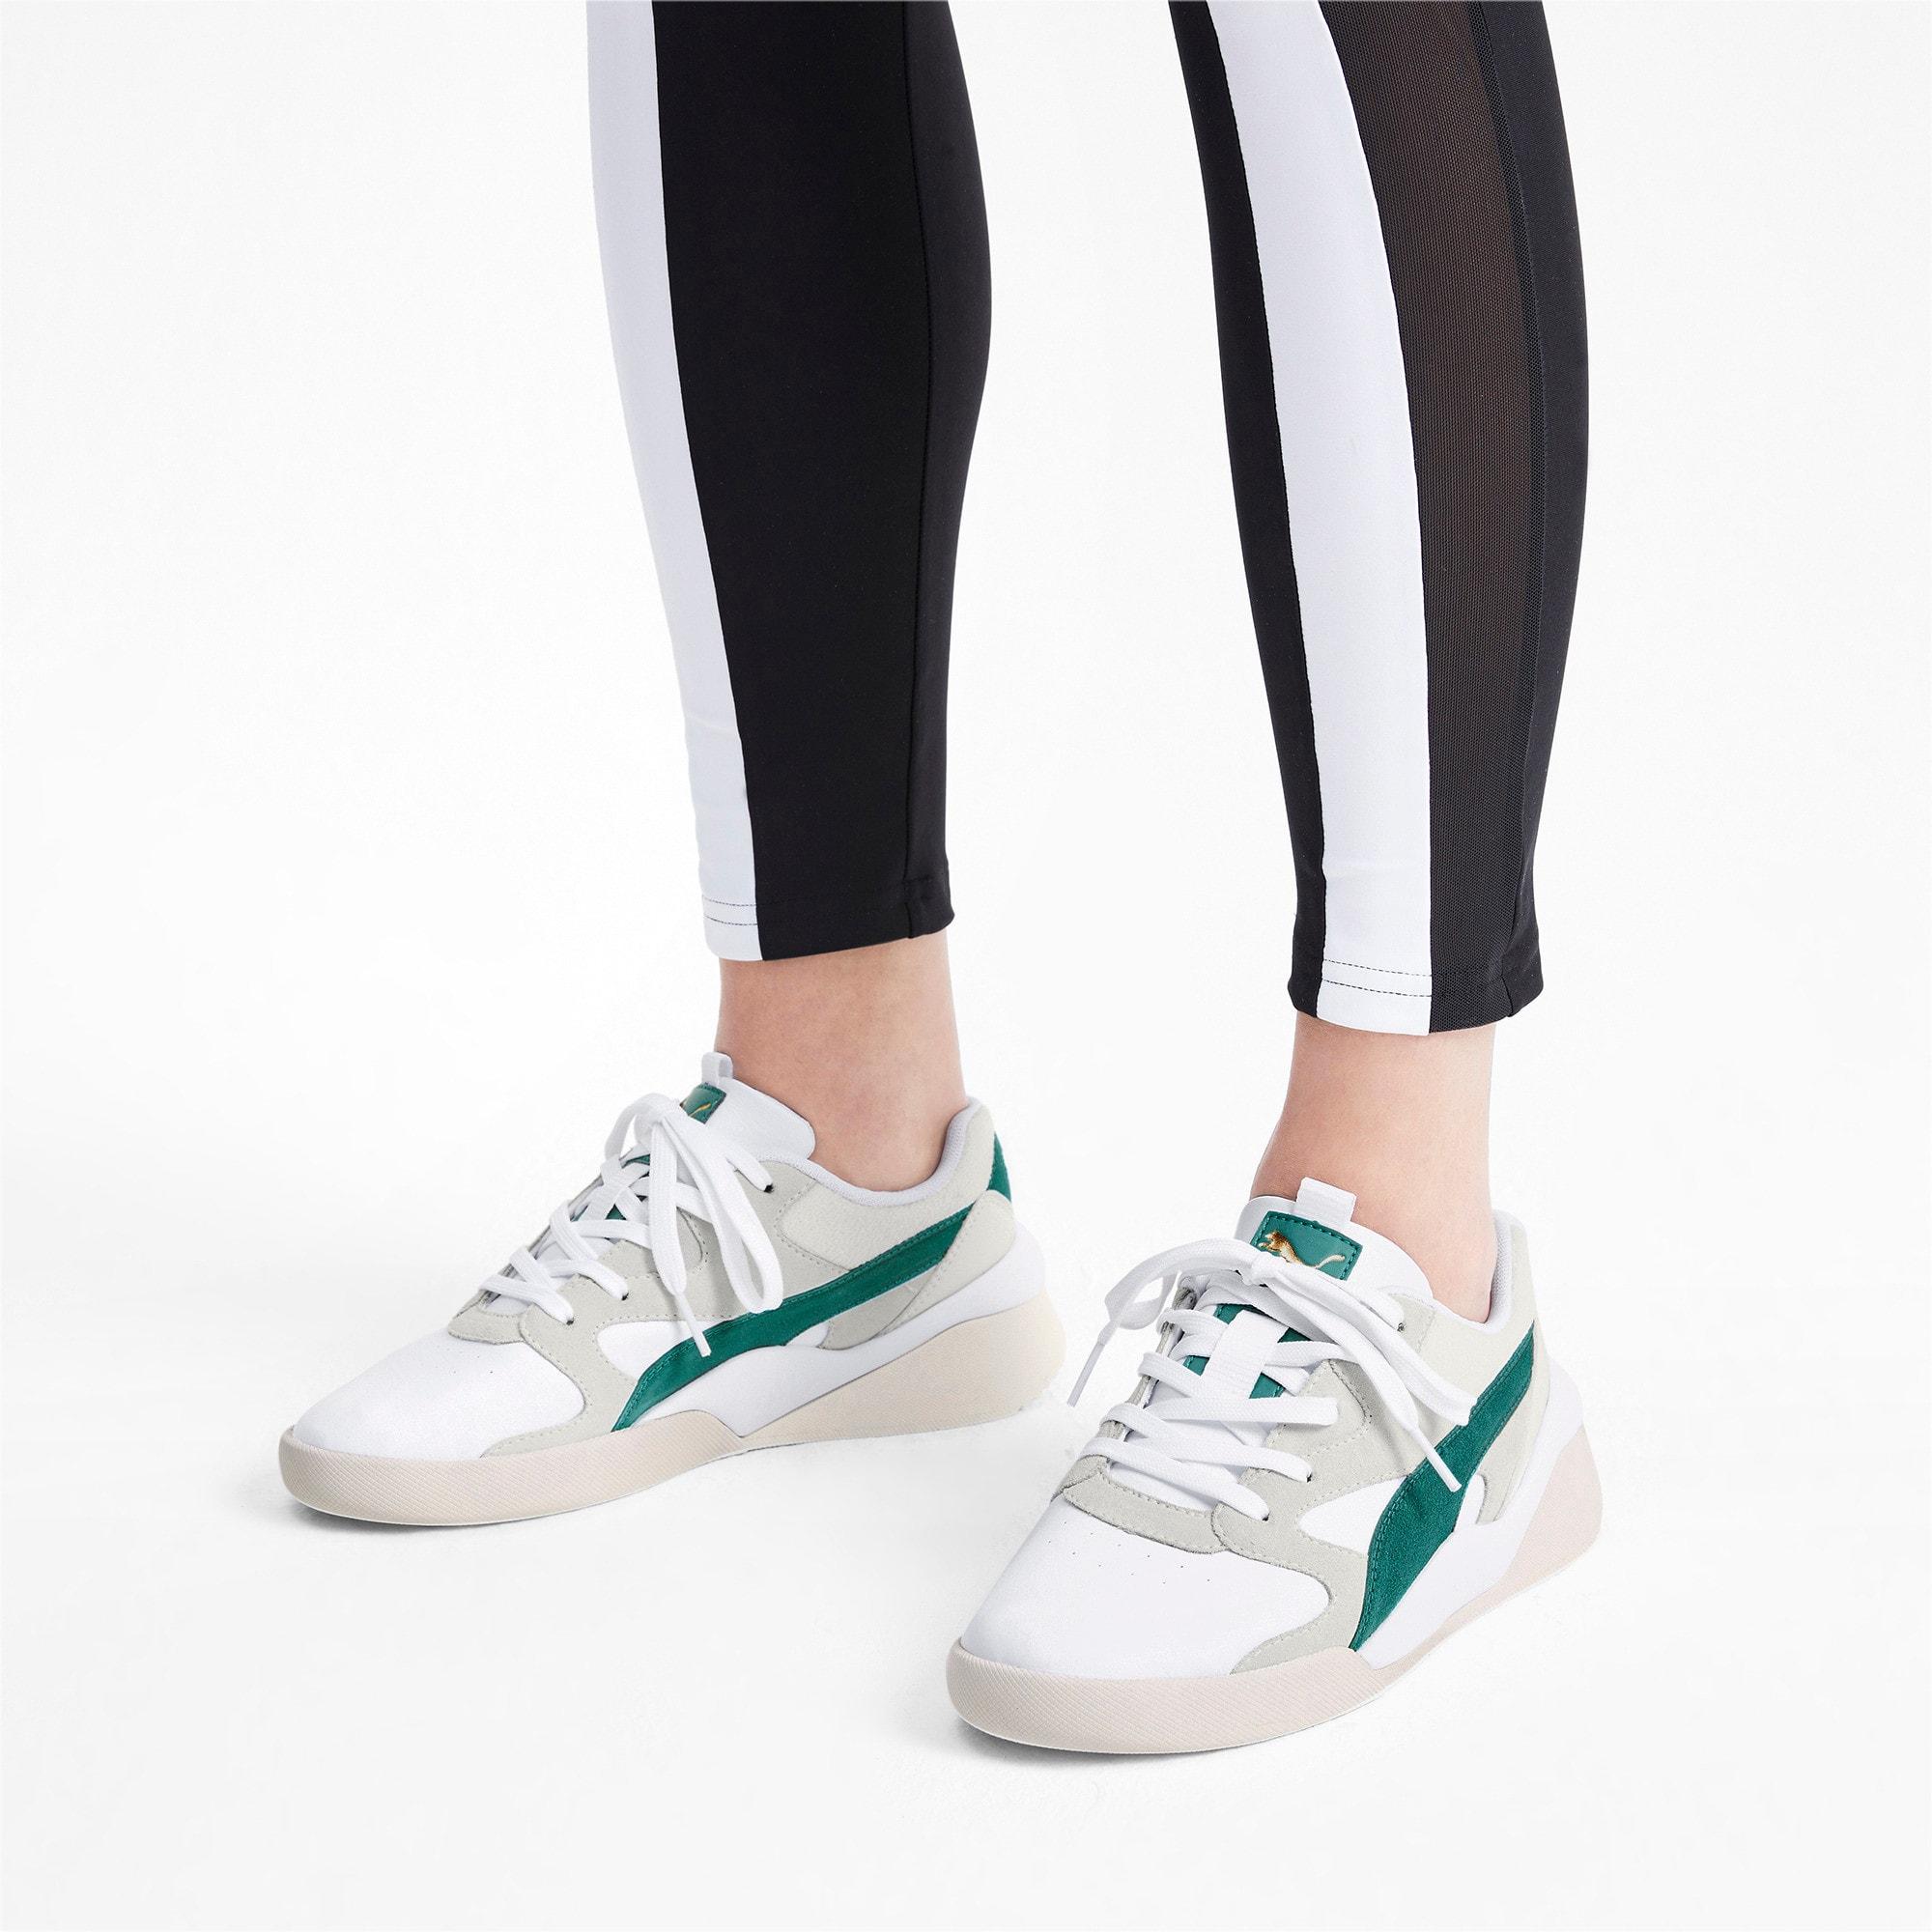 Thumbnail 2 of Aeon Heritage Women's Sneakers, Puma White-Teal Green, medium